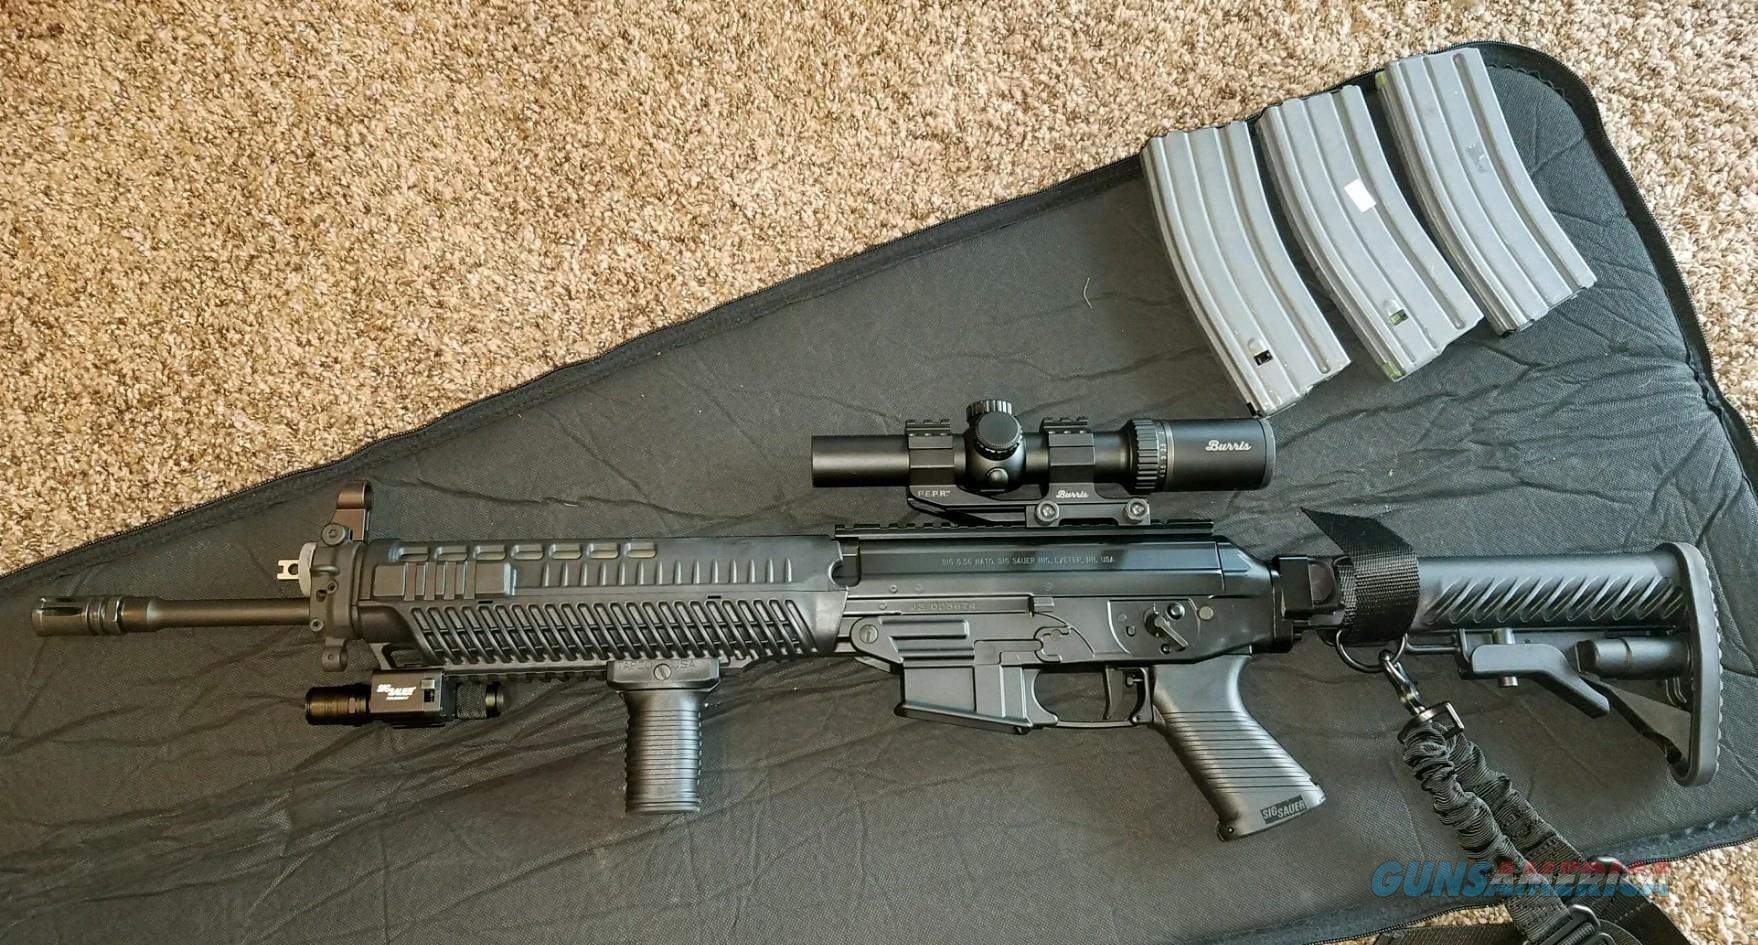 SIG SAUER 556 Rifle  Guns > Rifles > Sig - Sauer/Sigarms Rifles